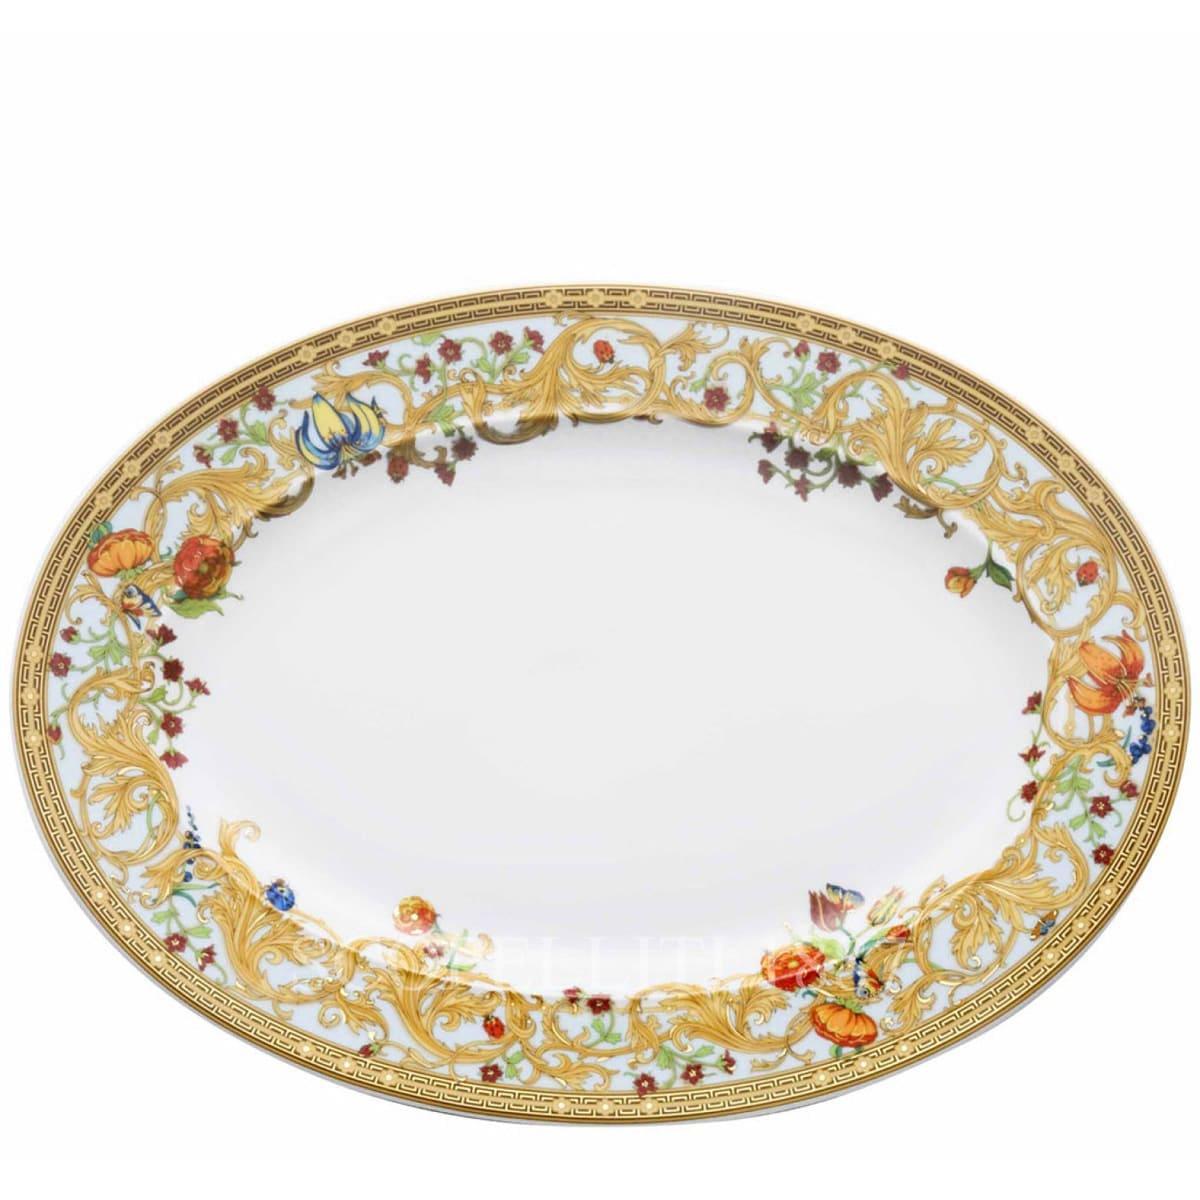 Versace Le Jardin de Versace Oval Platter 40 cm by Rosenthal